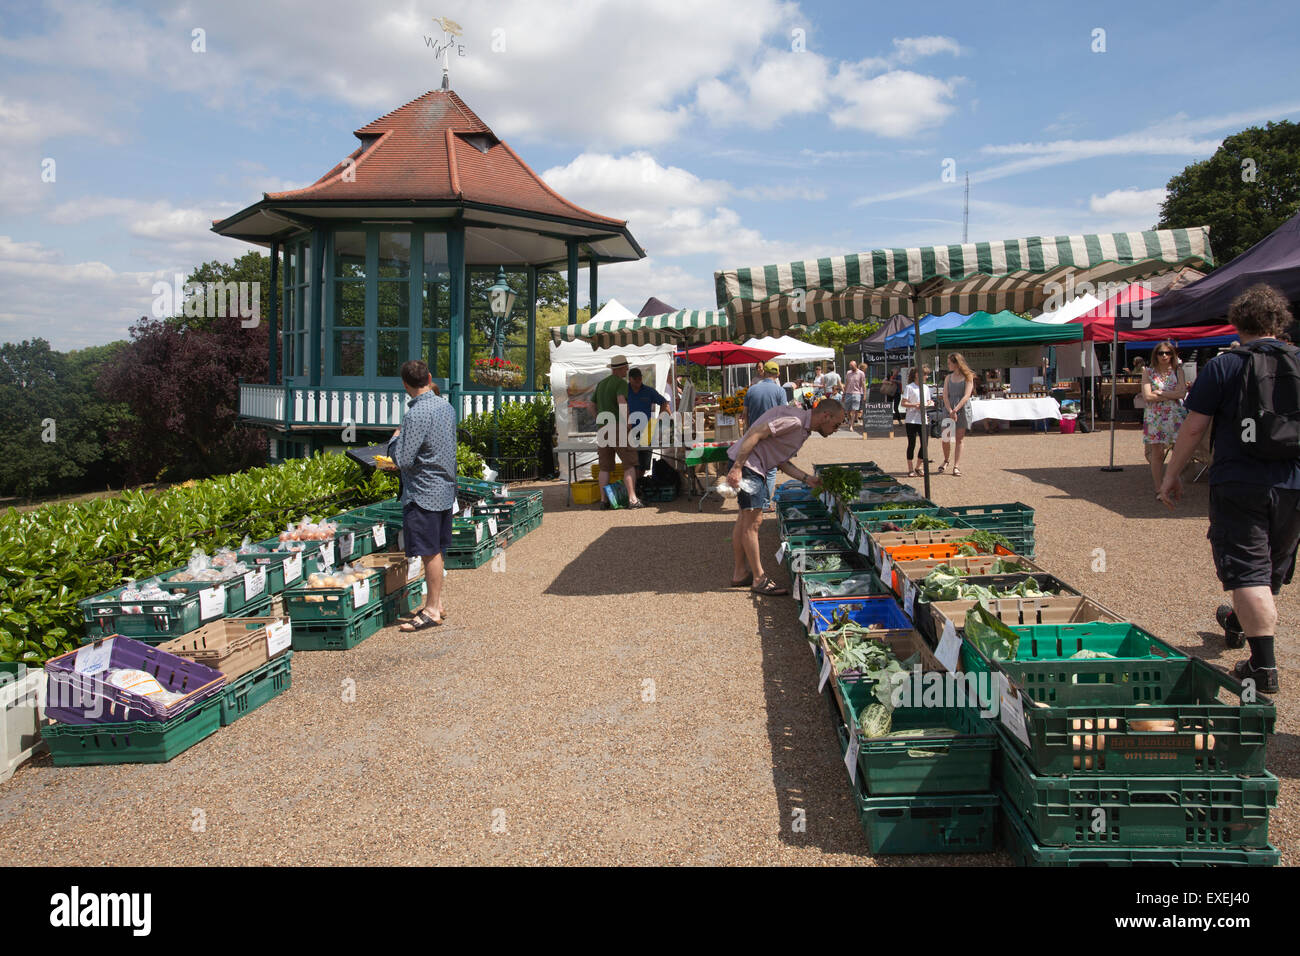 Horniman museum gardens - Farmers Market In The Grounds At The Horniman Museum And Gardens Forest Hill Southeast